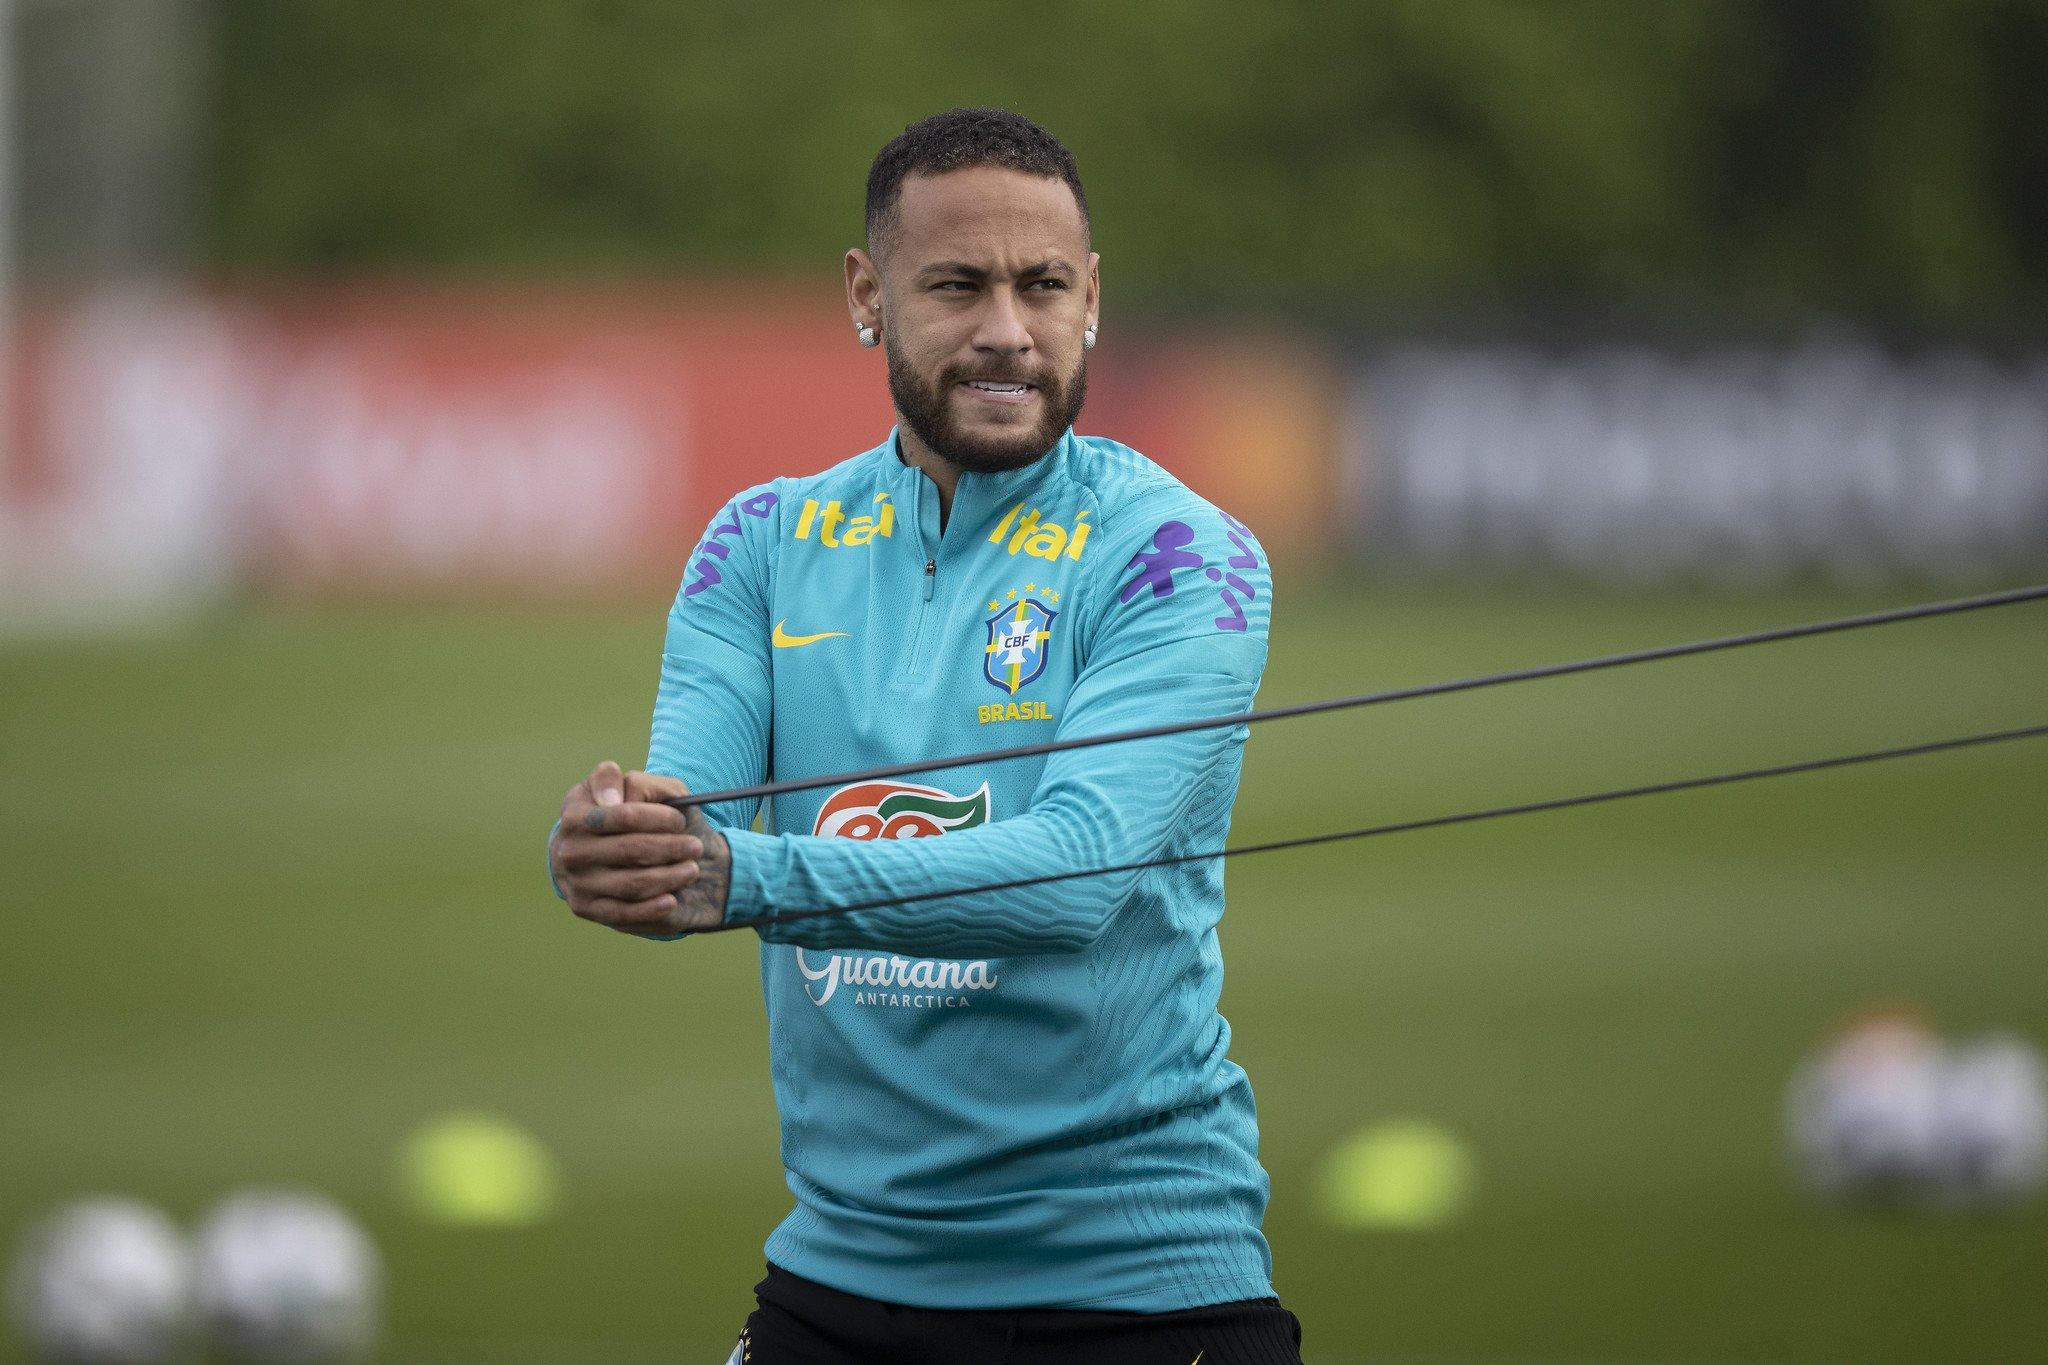 la bomba de neymar que adelanto la nostalgia entre los futboleros